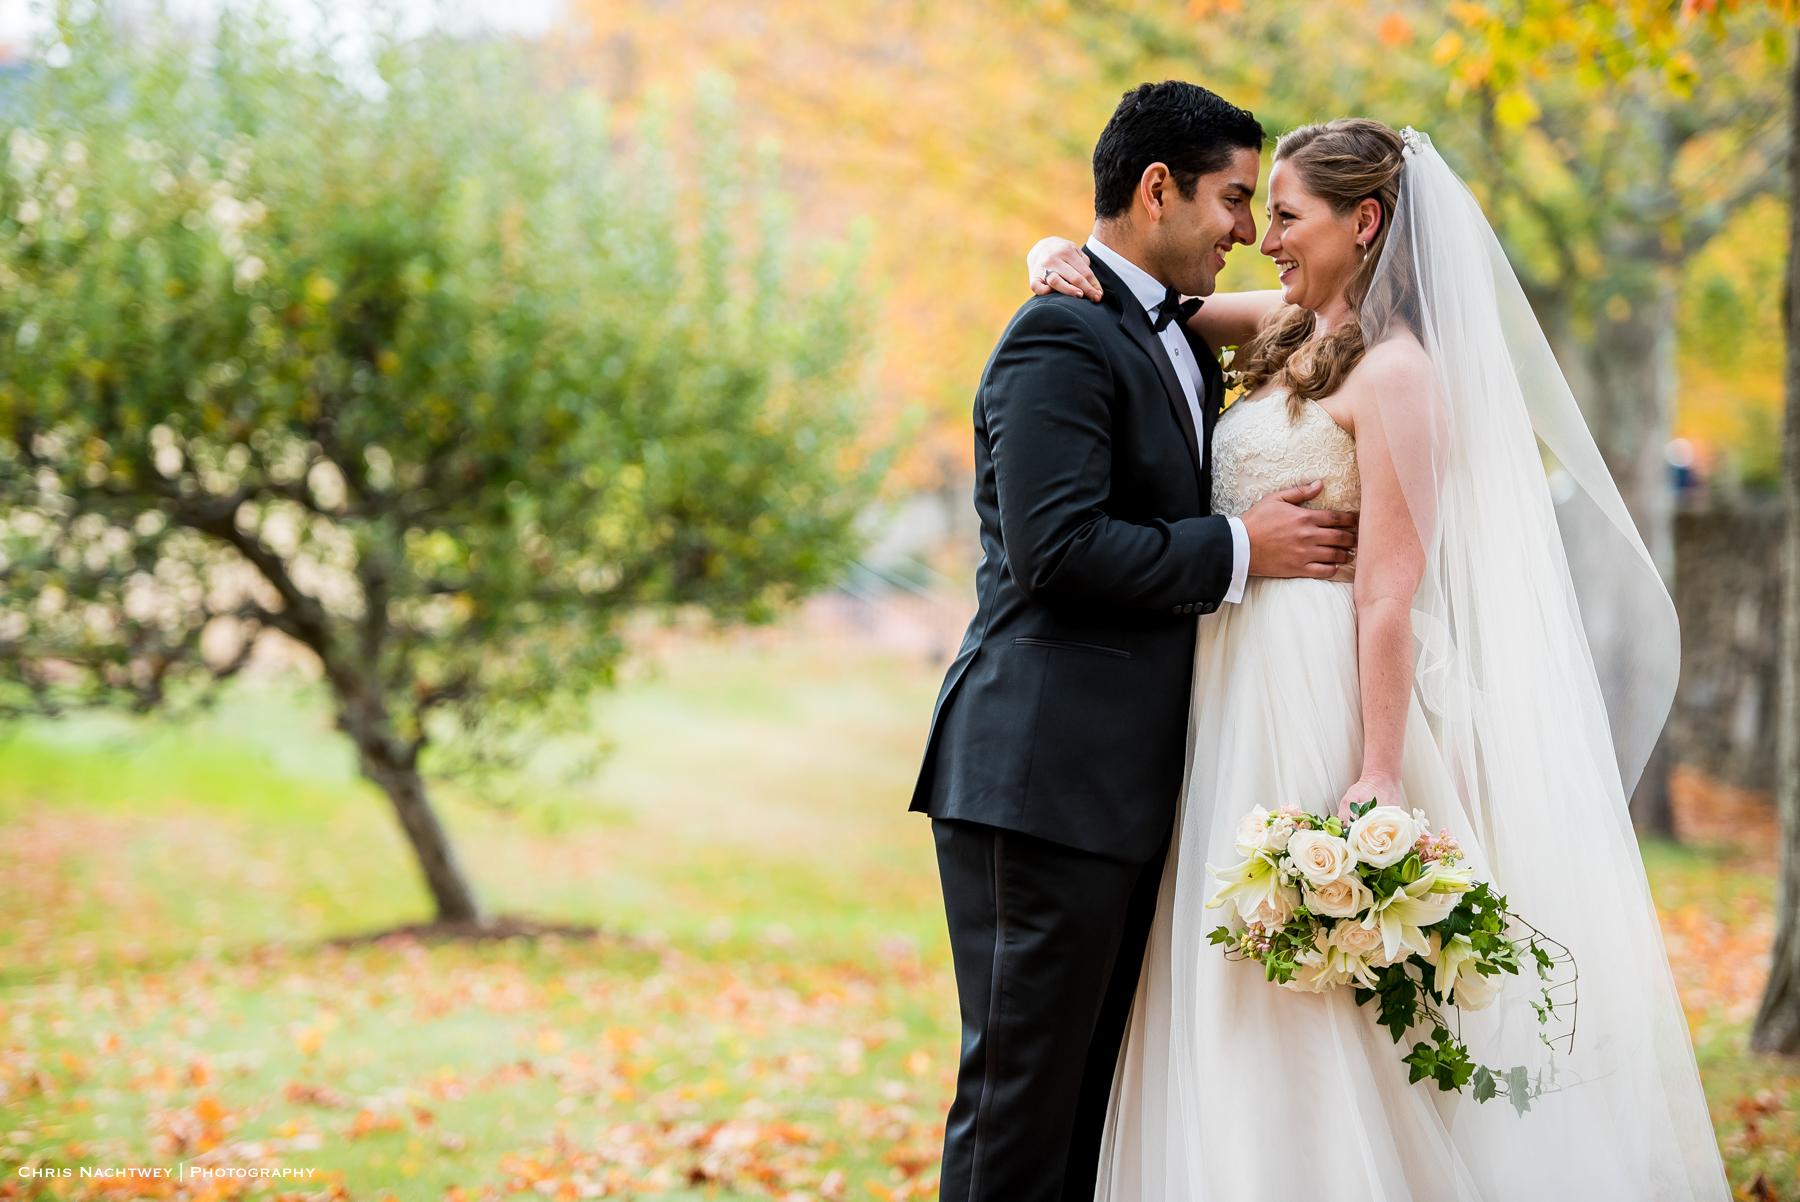 wedding-the-litchfield-inn-ct-photos-chris-nachtwey-photography-2018-23.jpg